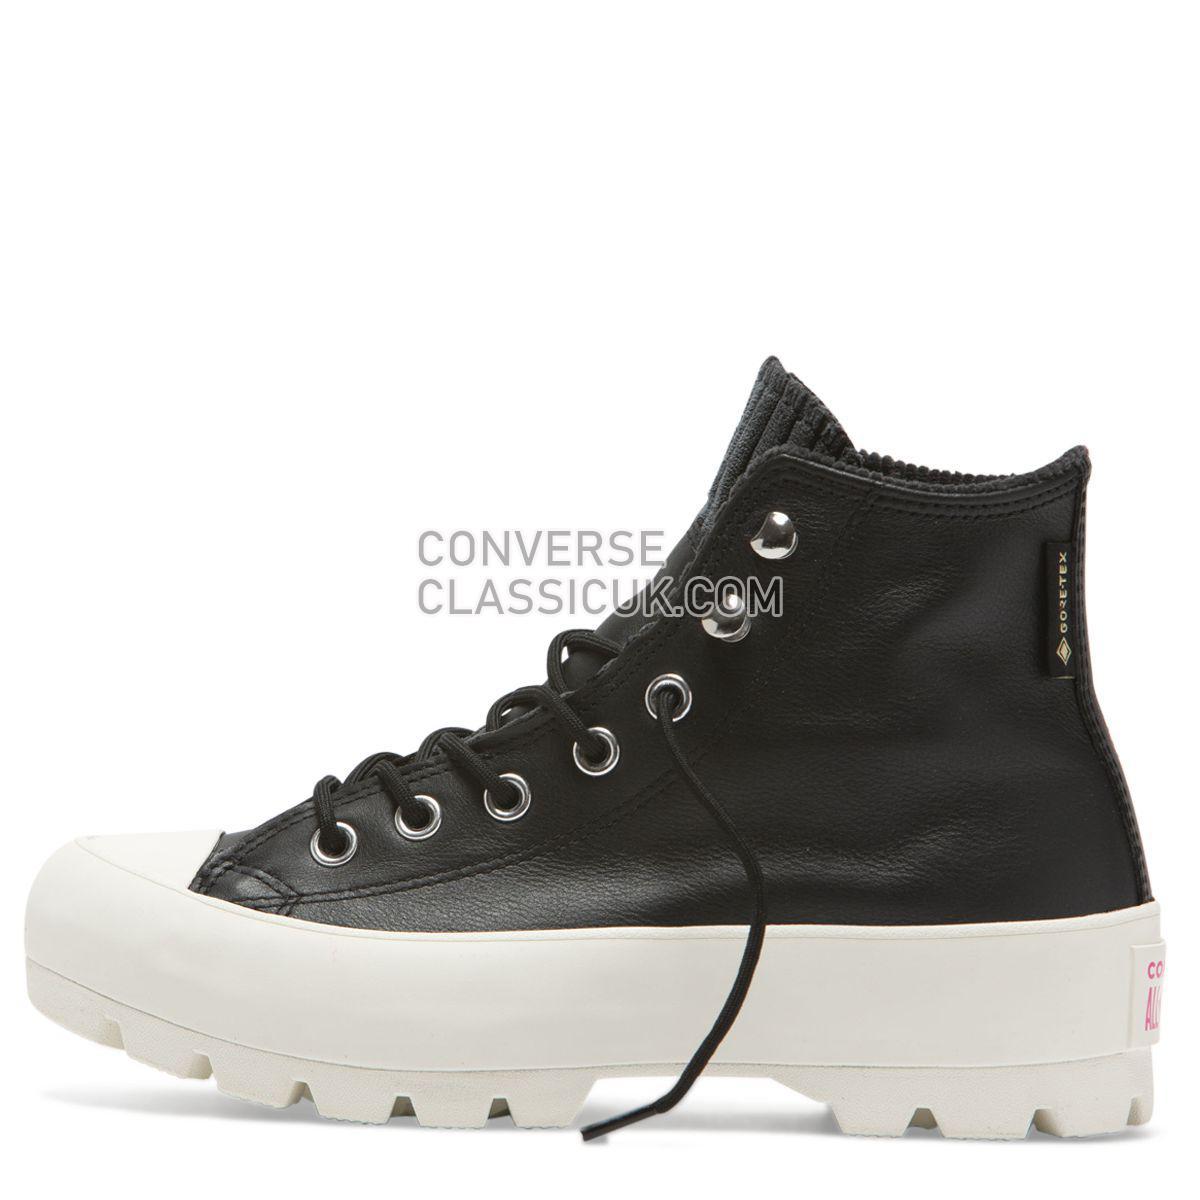 Converse Chuck Taylor All Star Lugged Winter Retrograde High Top Black Womens 565006 Black/Mod Pink/Egret Shoes